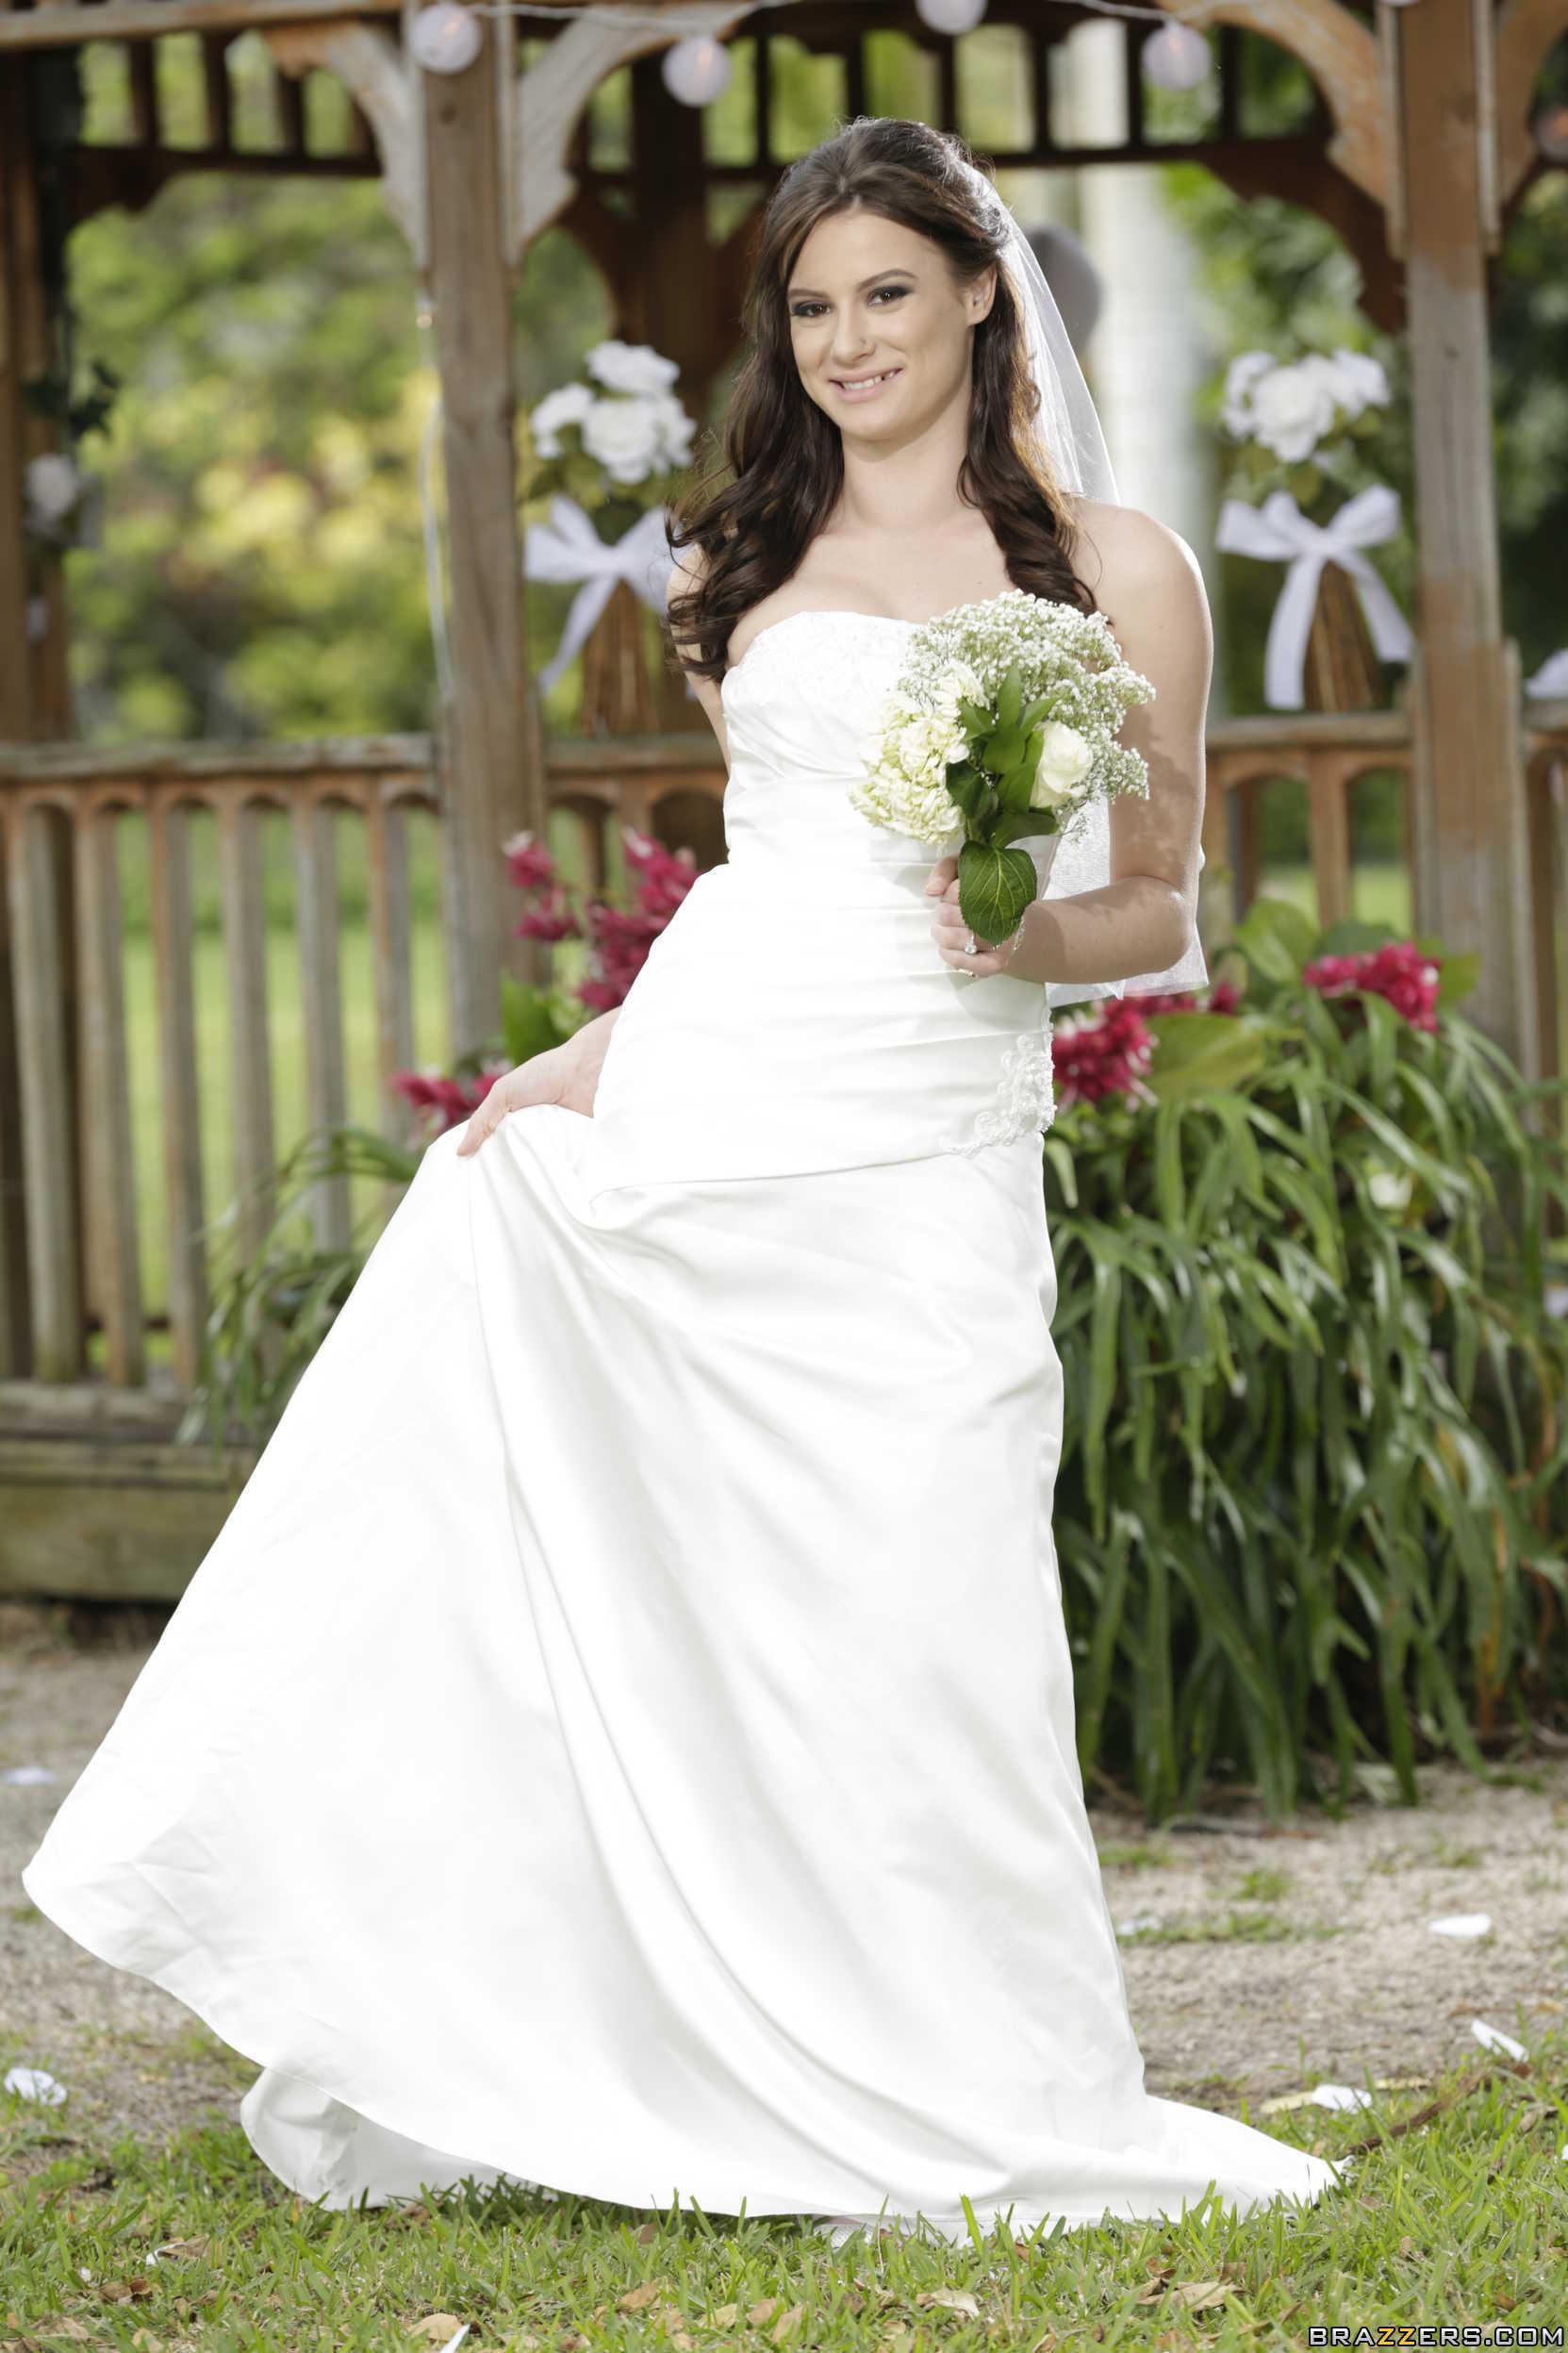 Kymberlee Anne - la novia muestra su conchita